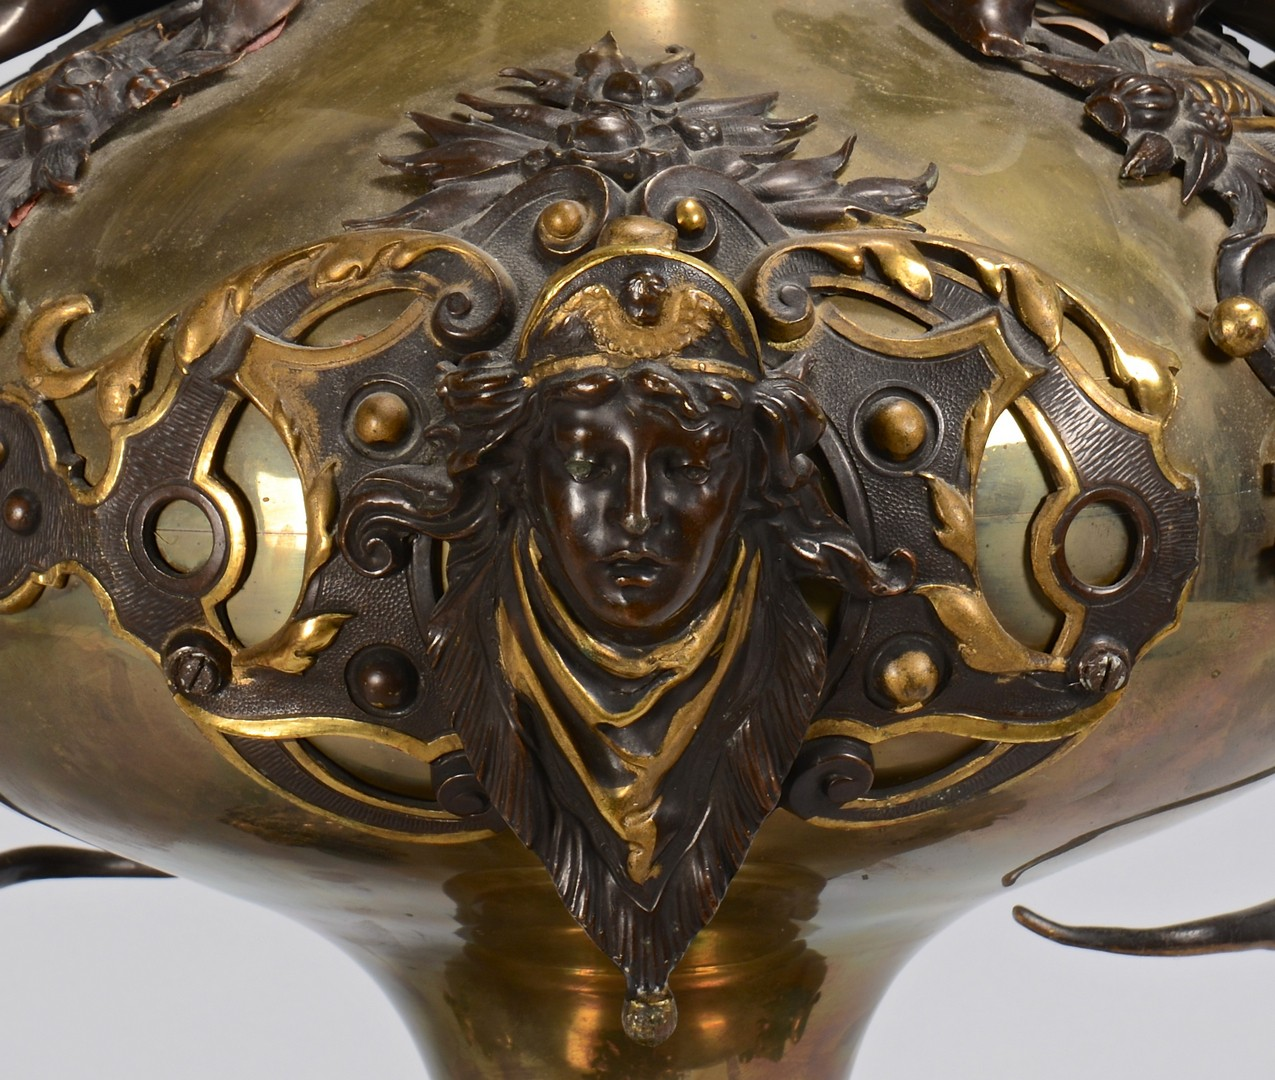 Lot 16: Bronze Dragon Vase, Aesthetic Influence